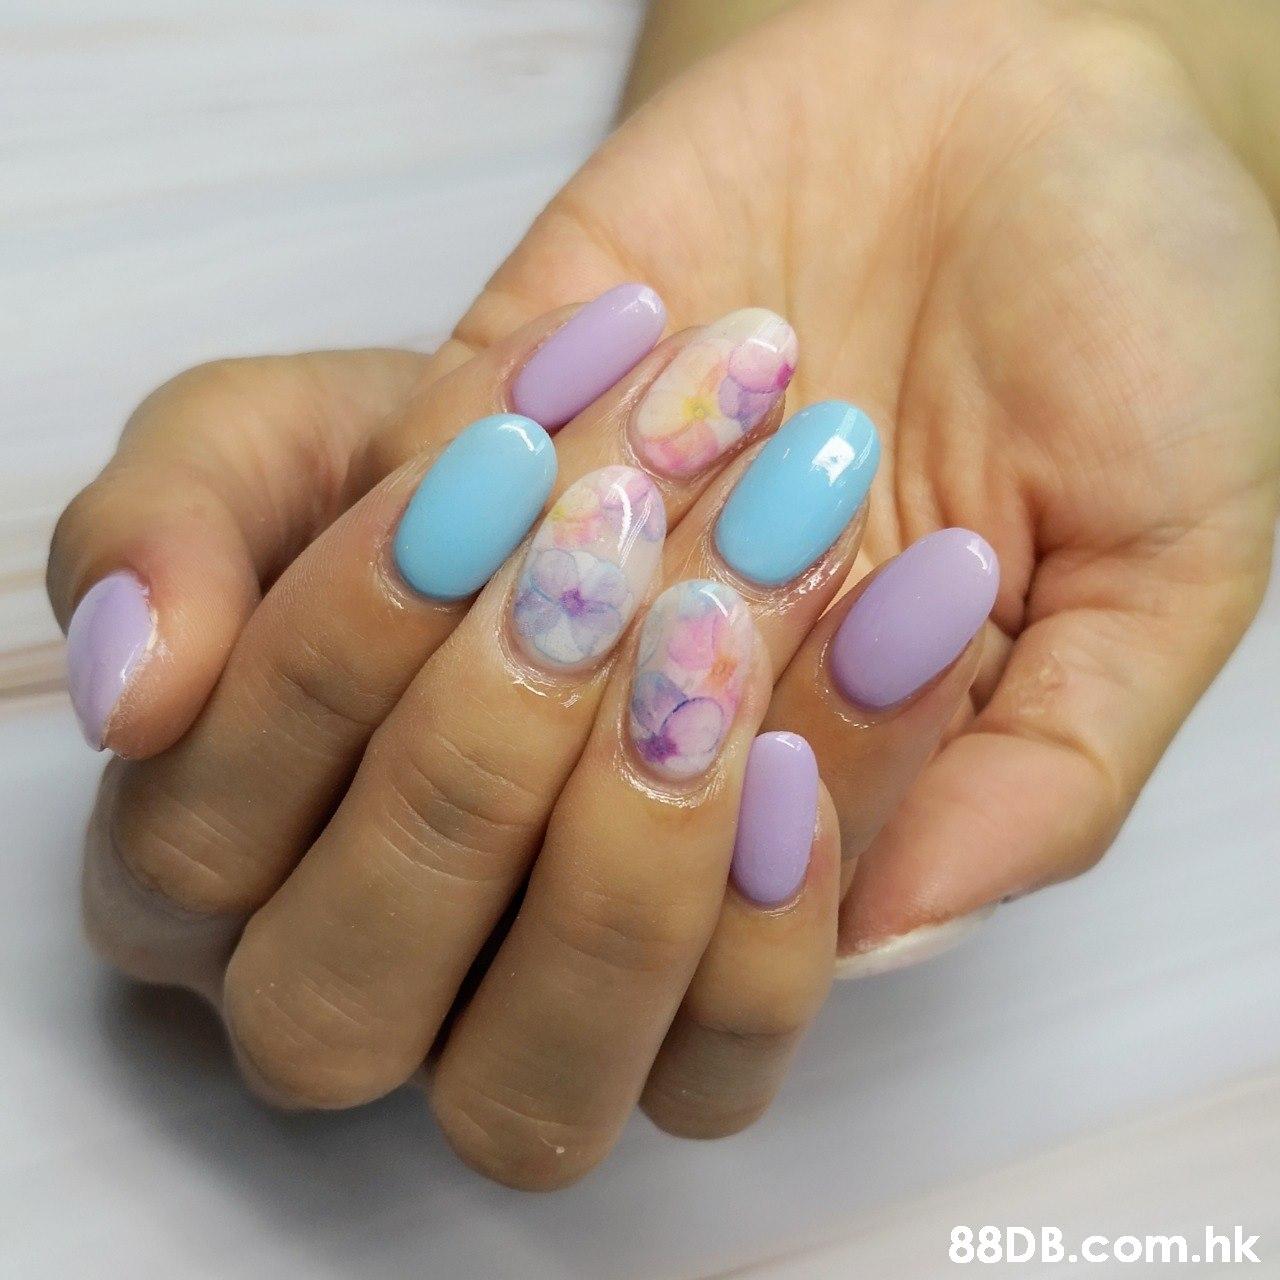 .hk  Nail polish,Nail,Nail care,Manicure,Cosmetics